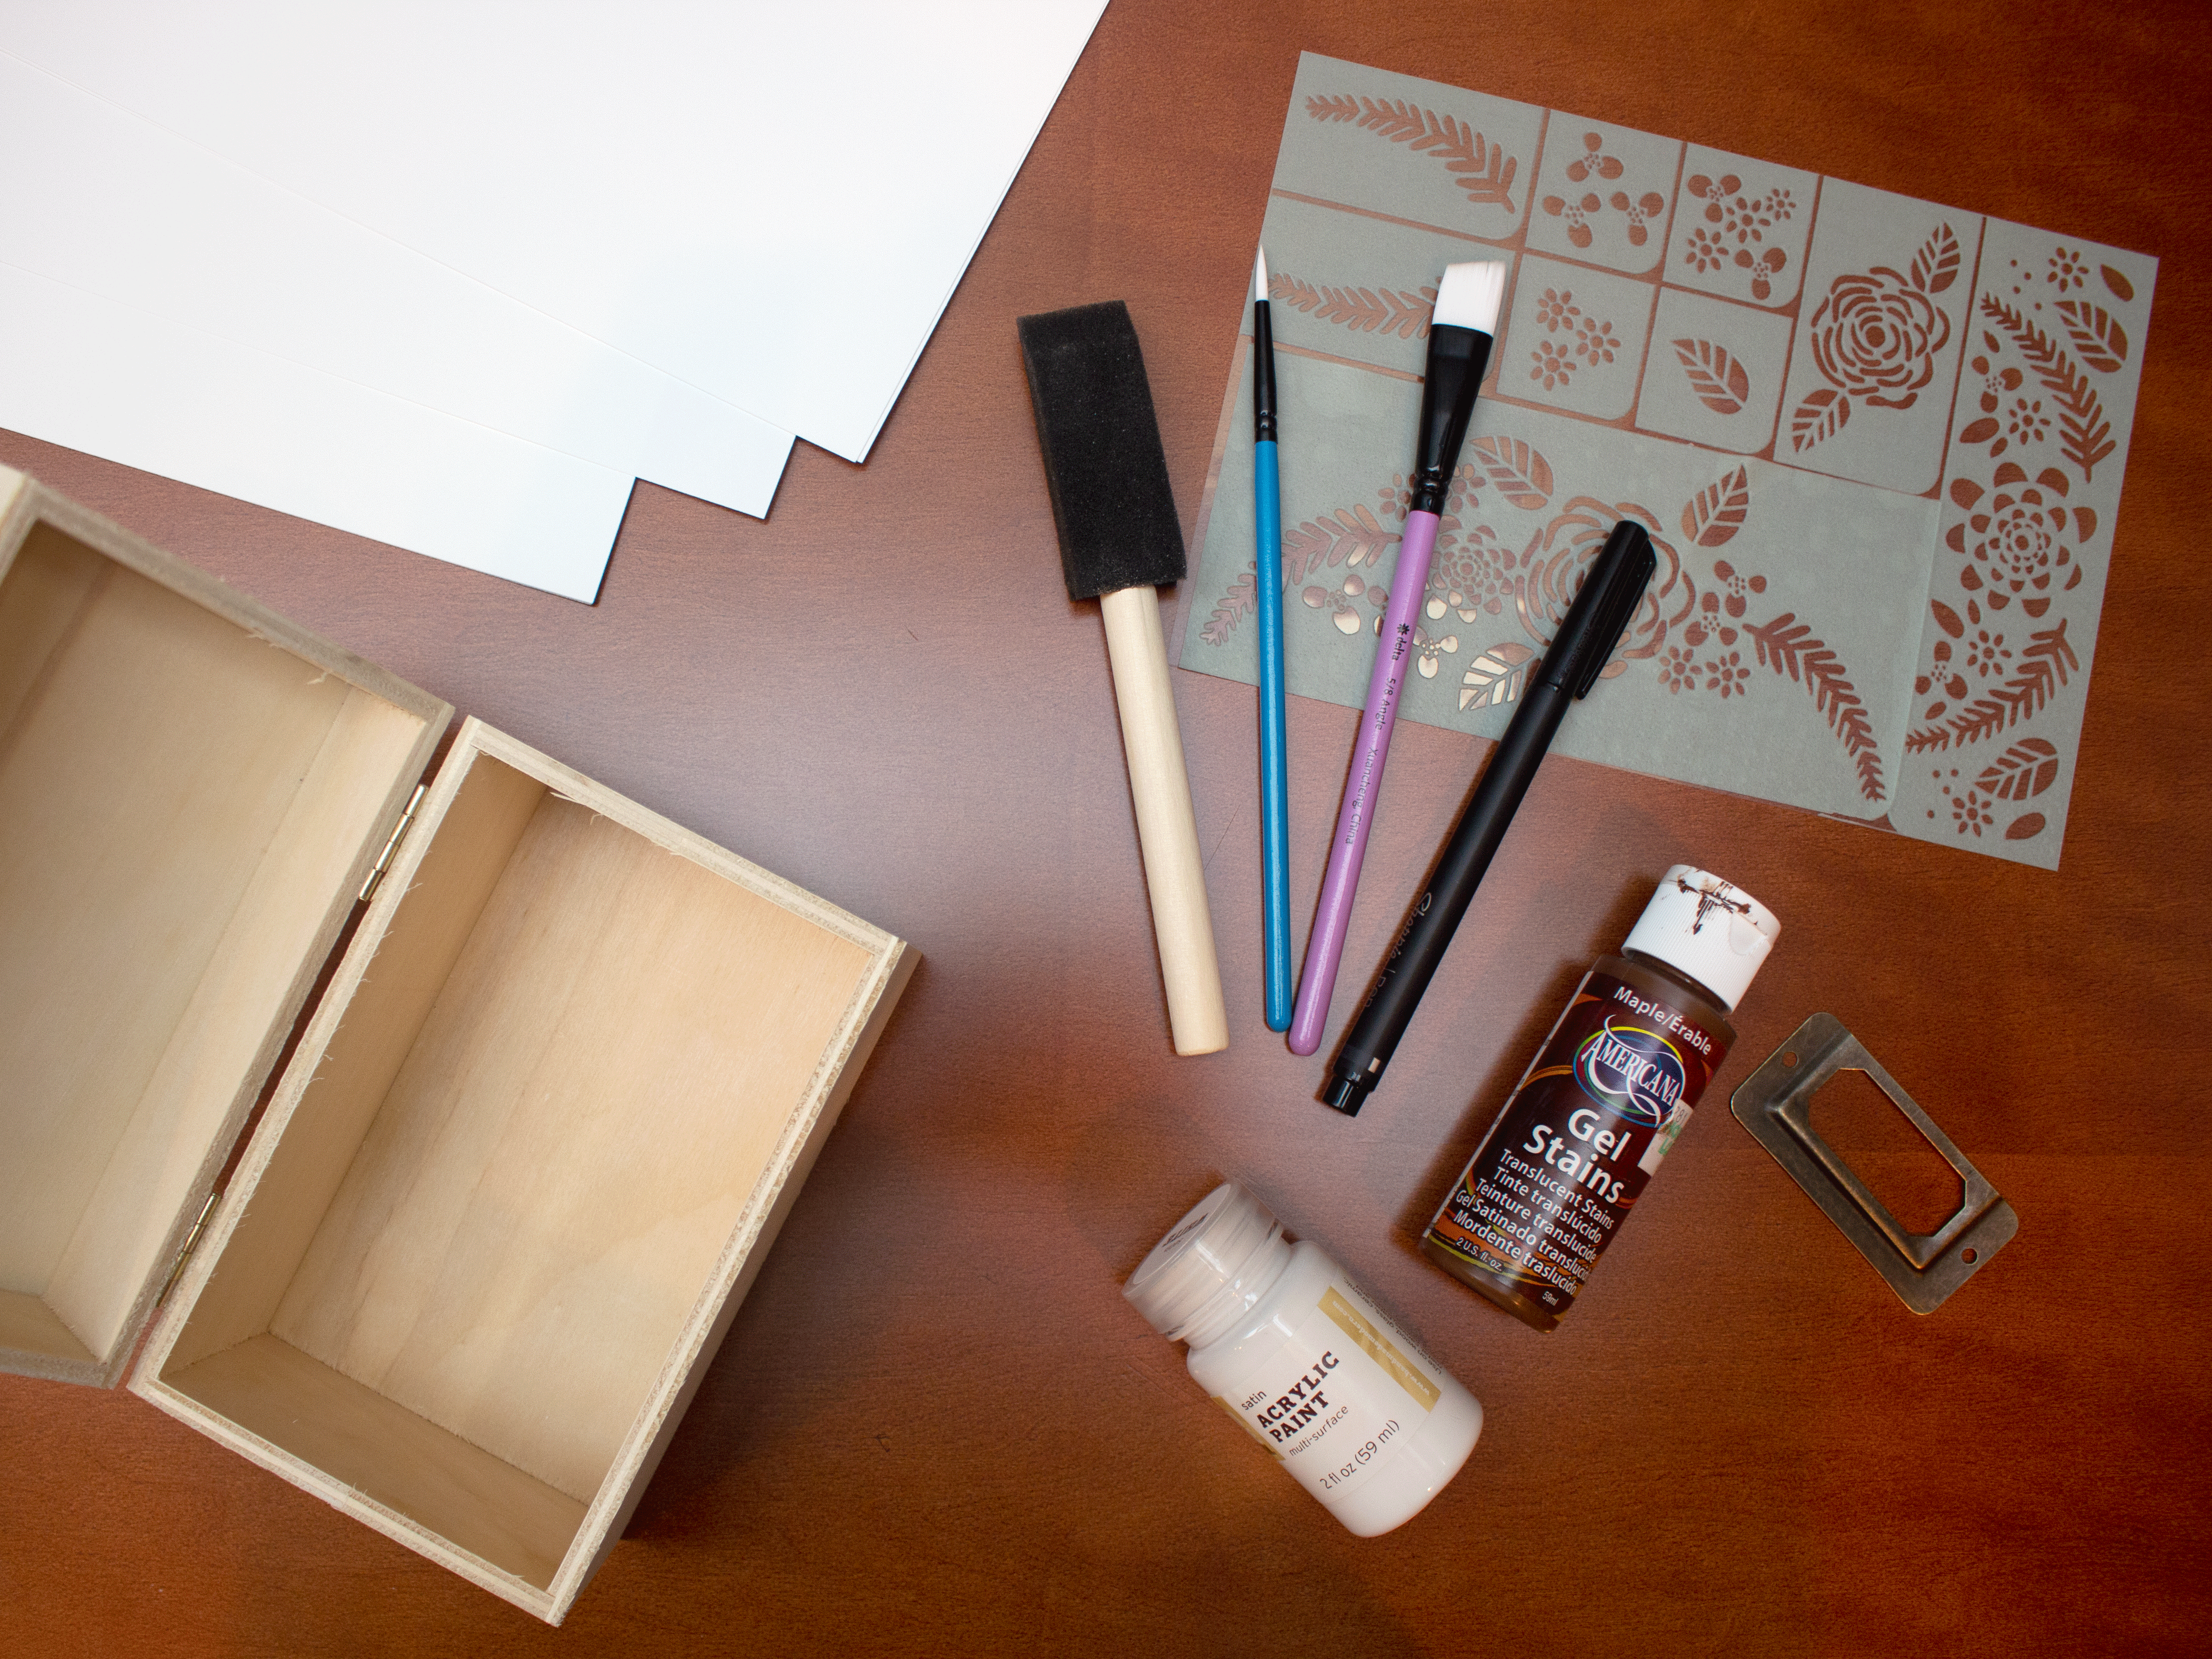 Recipe Box Supplies